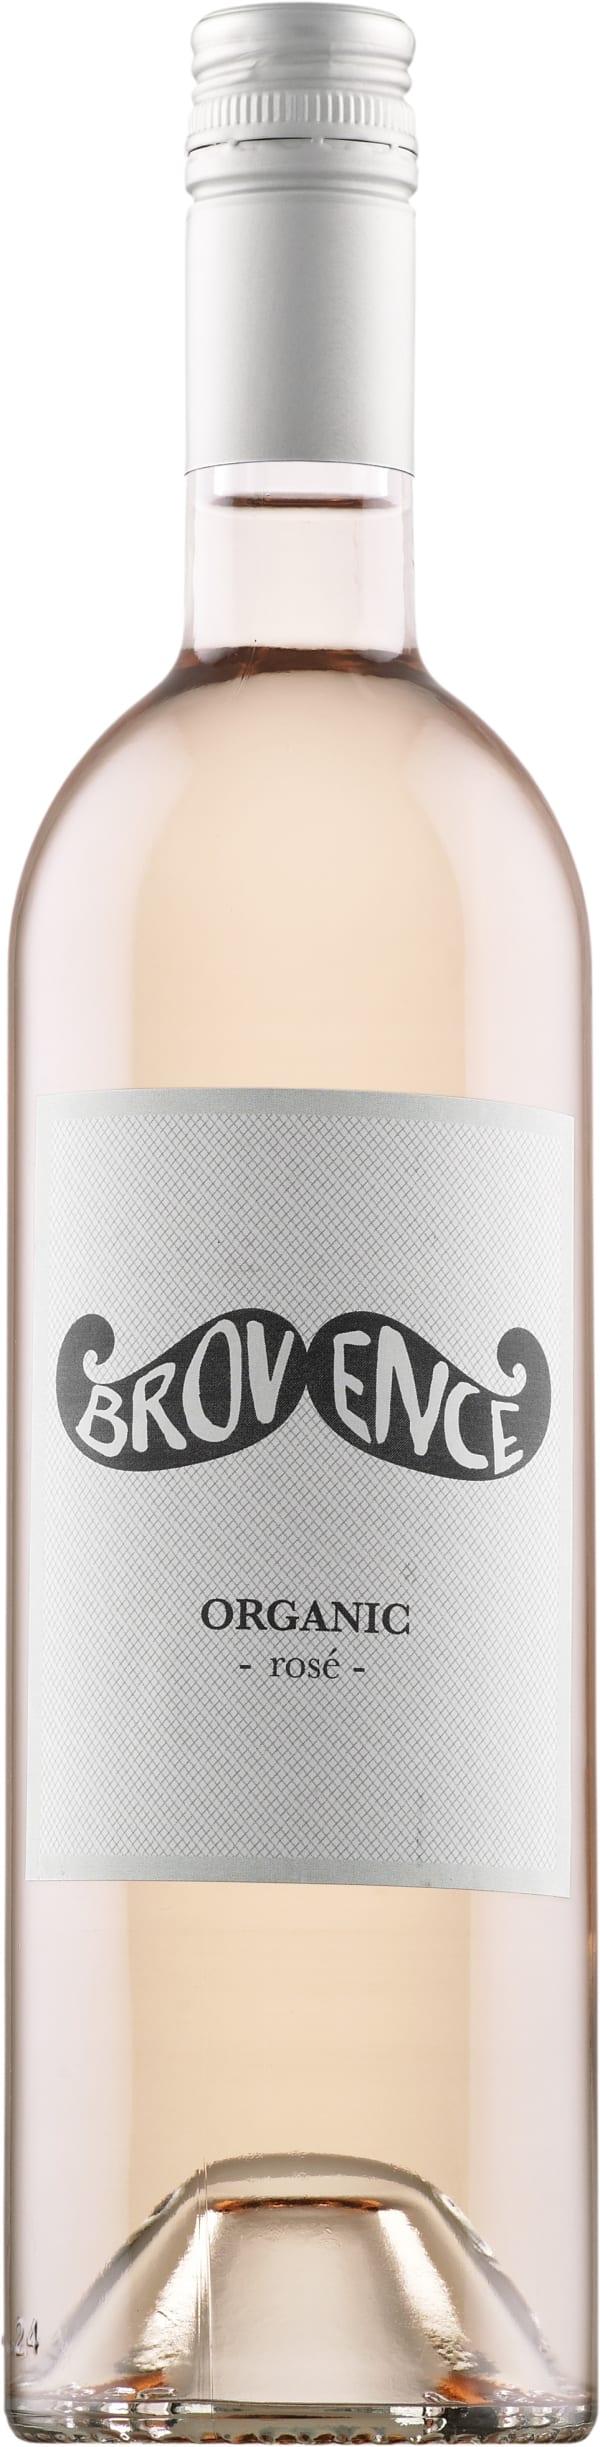 Brovence Organic Rosé 2016